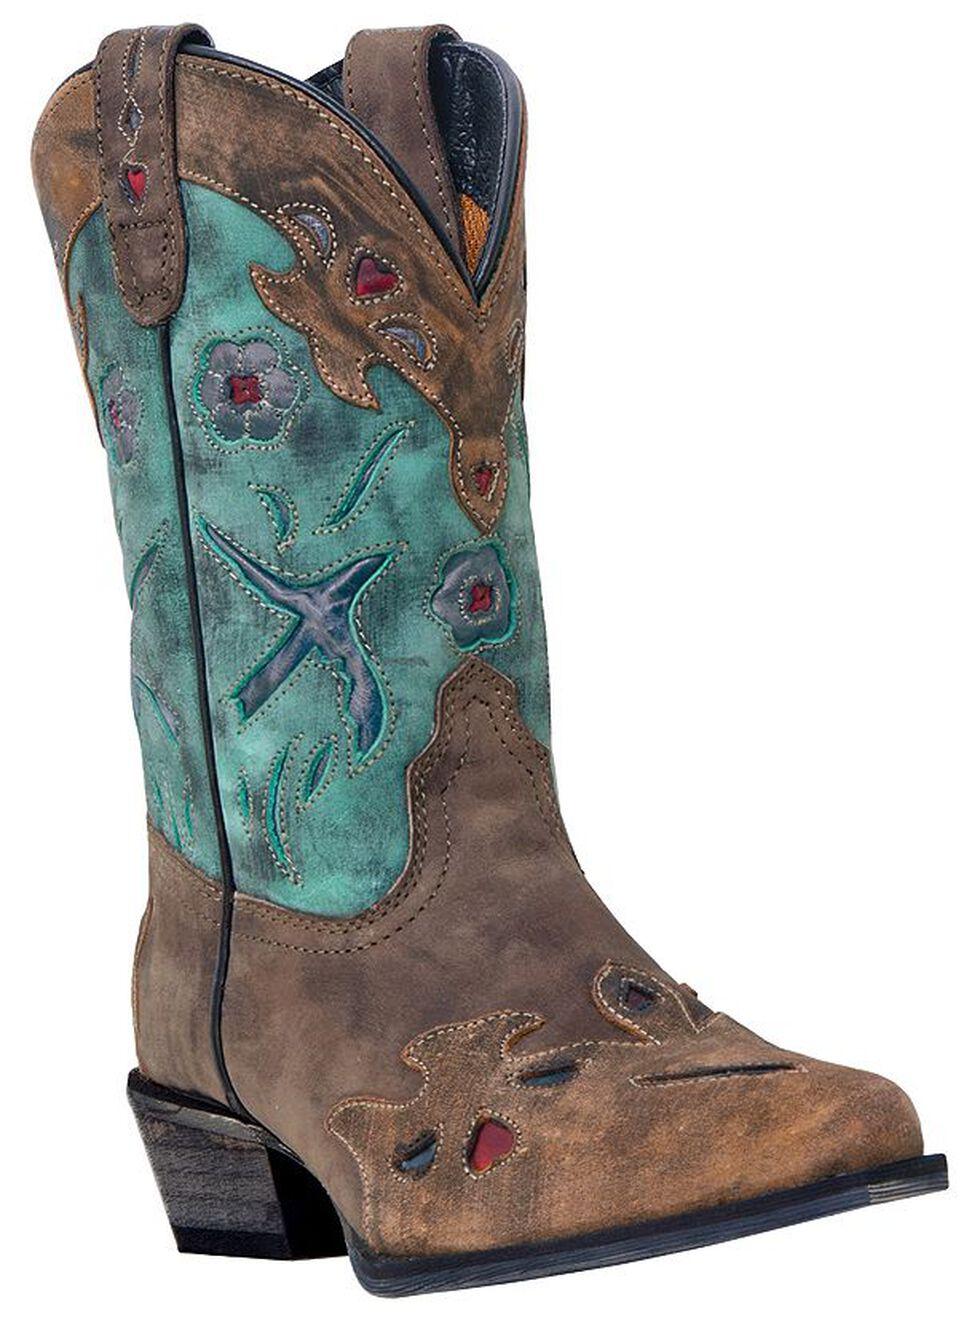 Dan Post Youth Girls' Blue Bird Cowgirl Boots - Snip Toe, Brown, hi-res